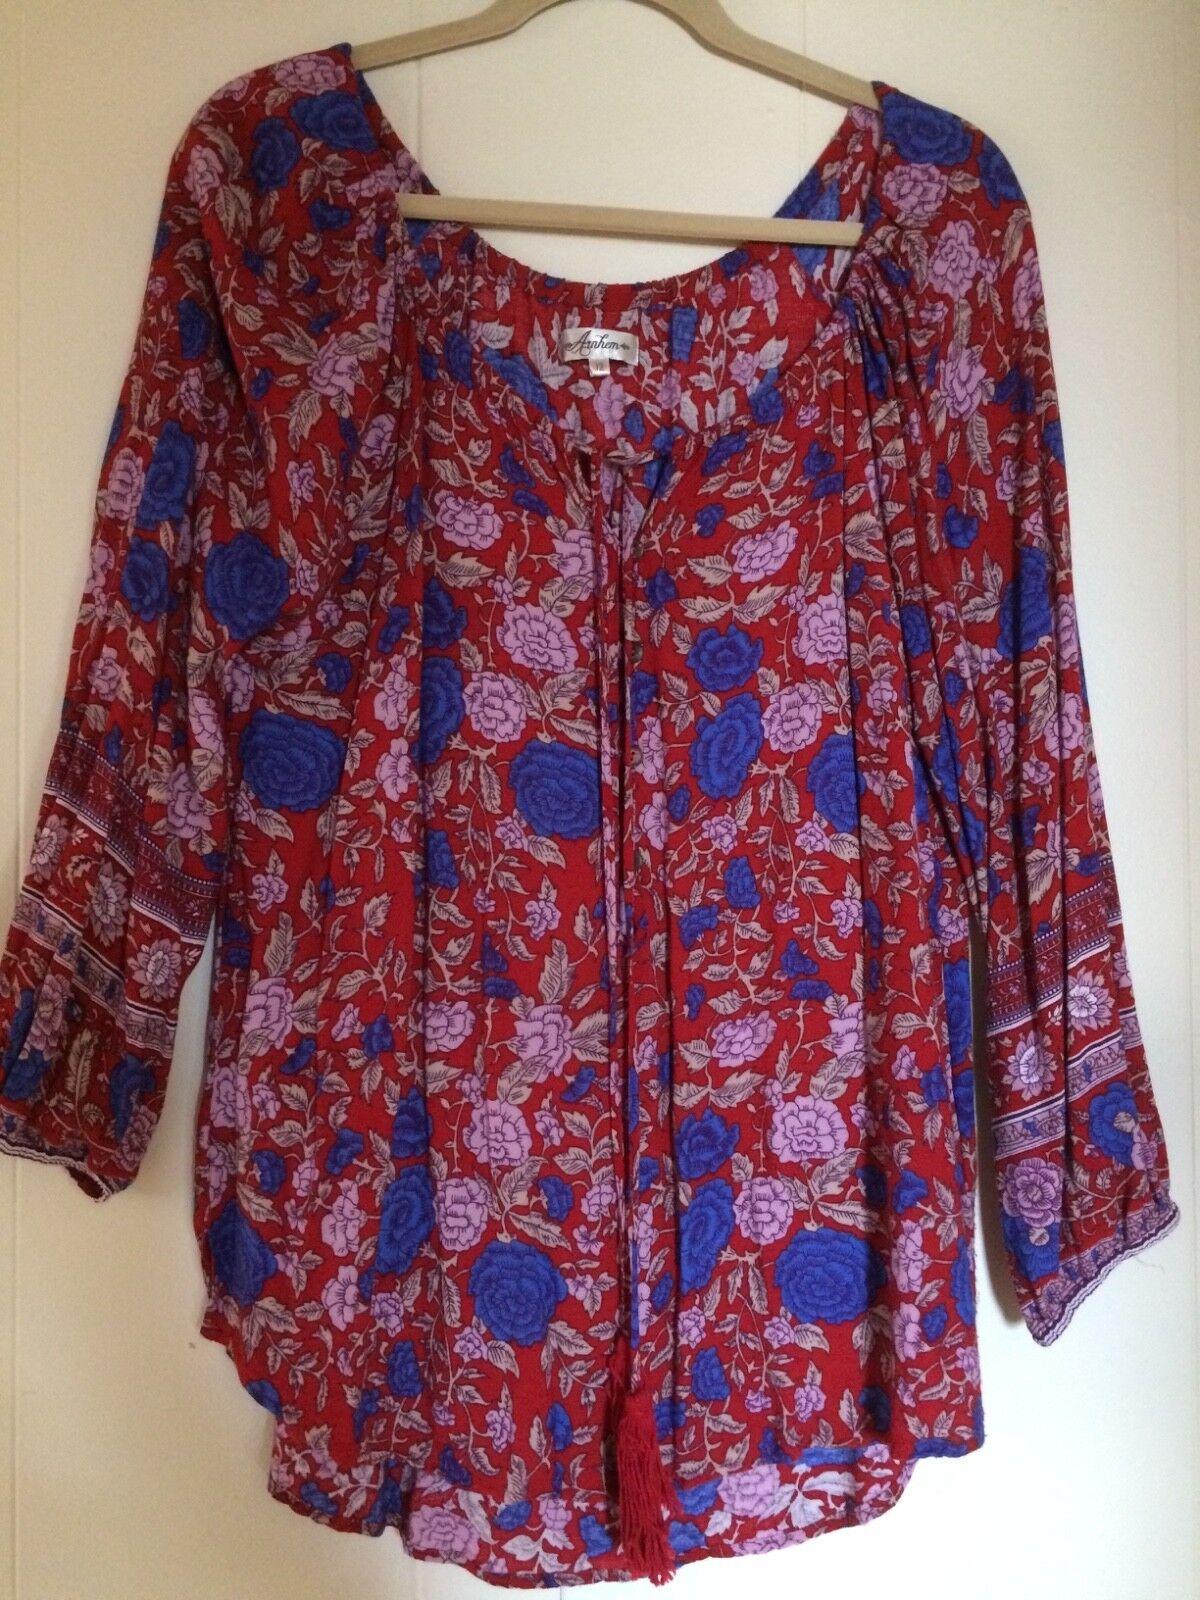 Woherren Arnhem Spanish Rosa tunic Scarlett blouse Größe AU12 US8